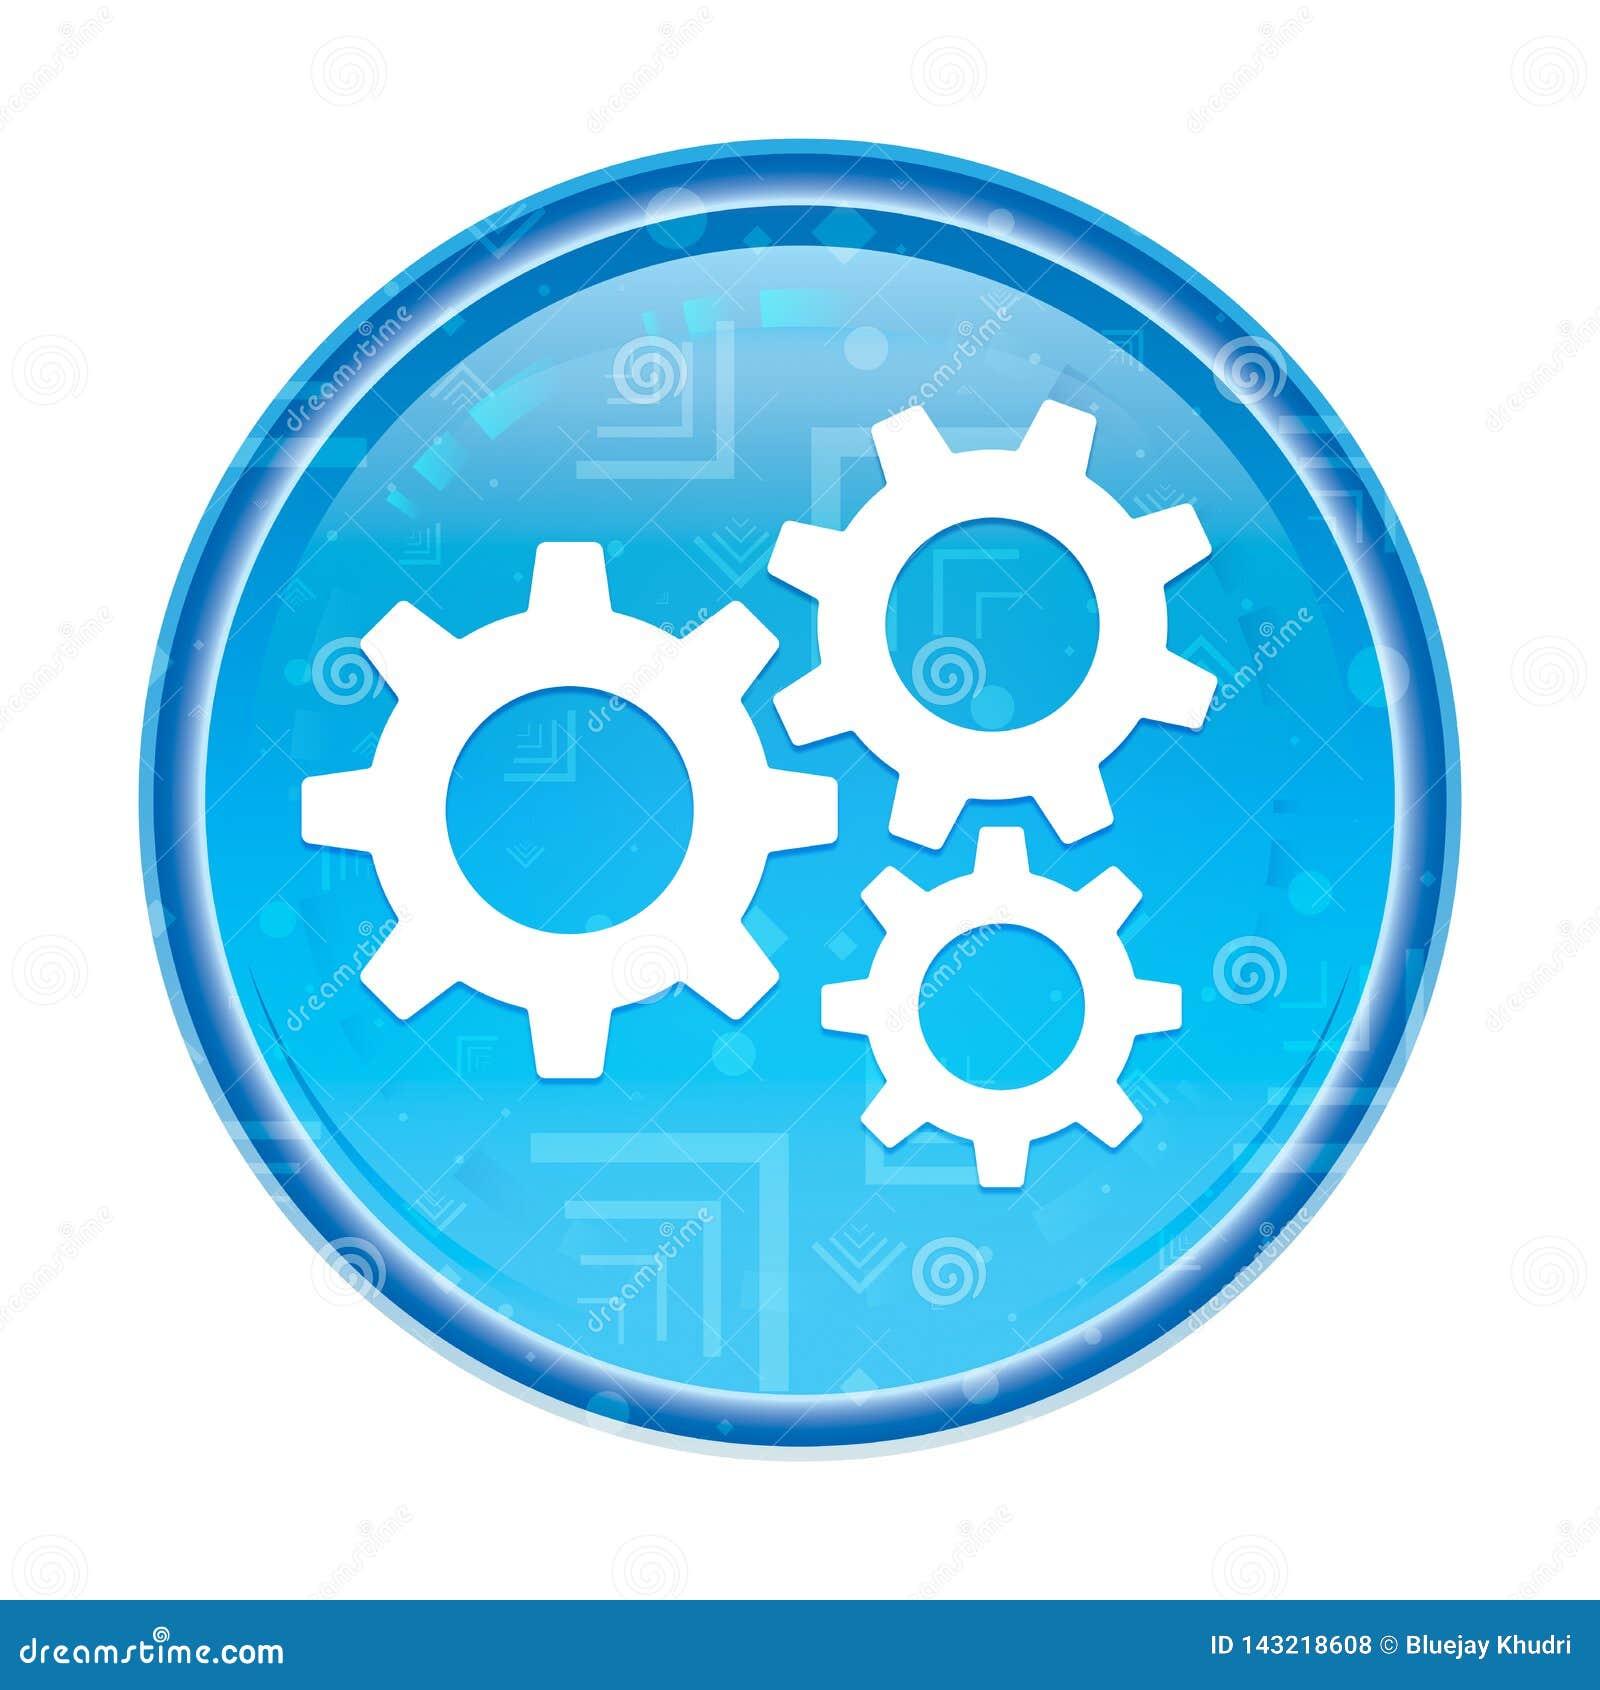 Floral μπλε στρογγυλό κουμπί εικονιδίων εργαλείων τοποθετήσεων